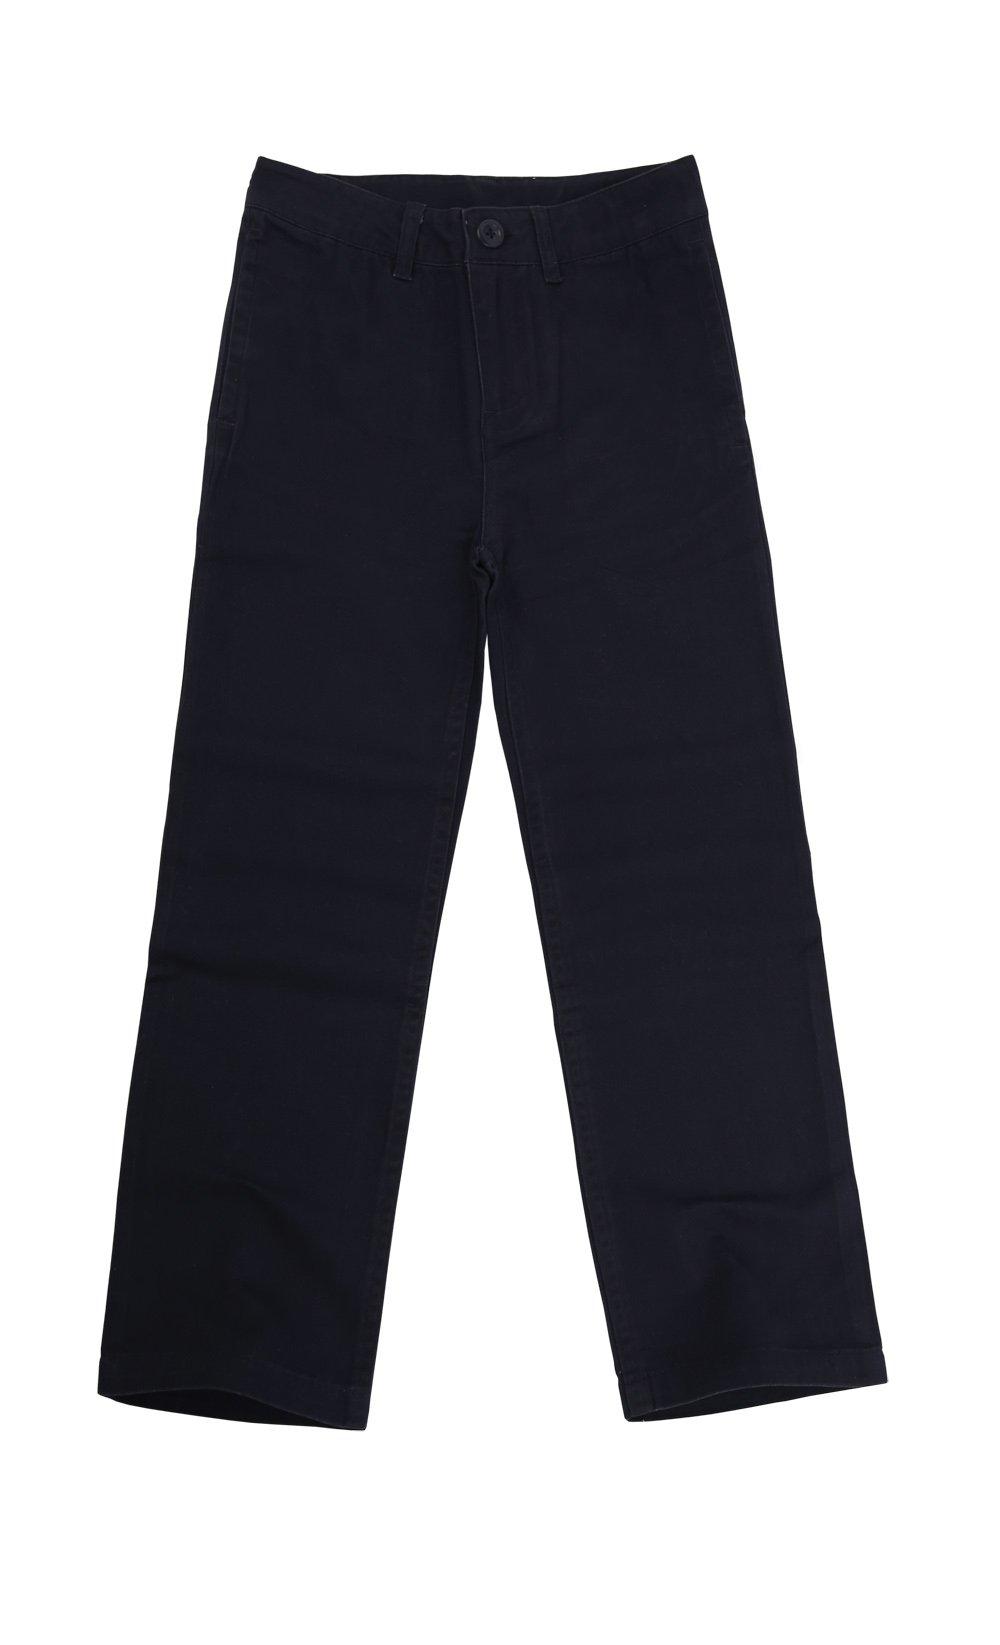 Bienzoe Big Boy's School Uniforms Flat Front Adjust Waist Pants Navy Size 16